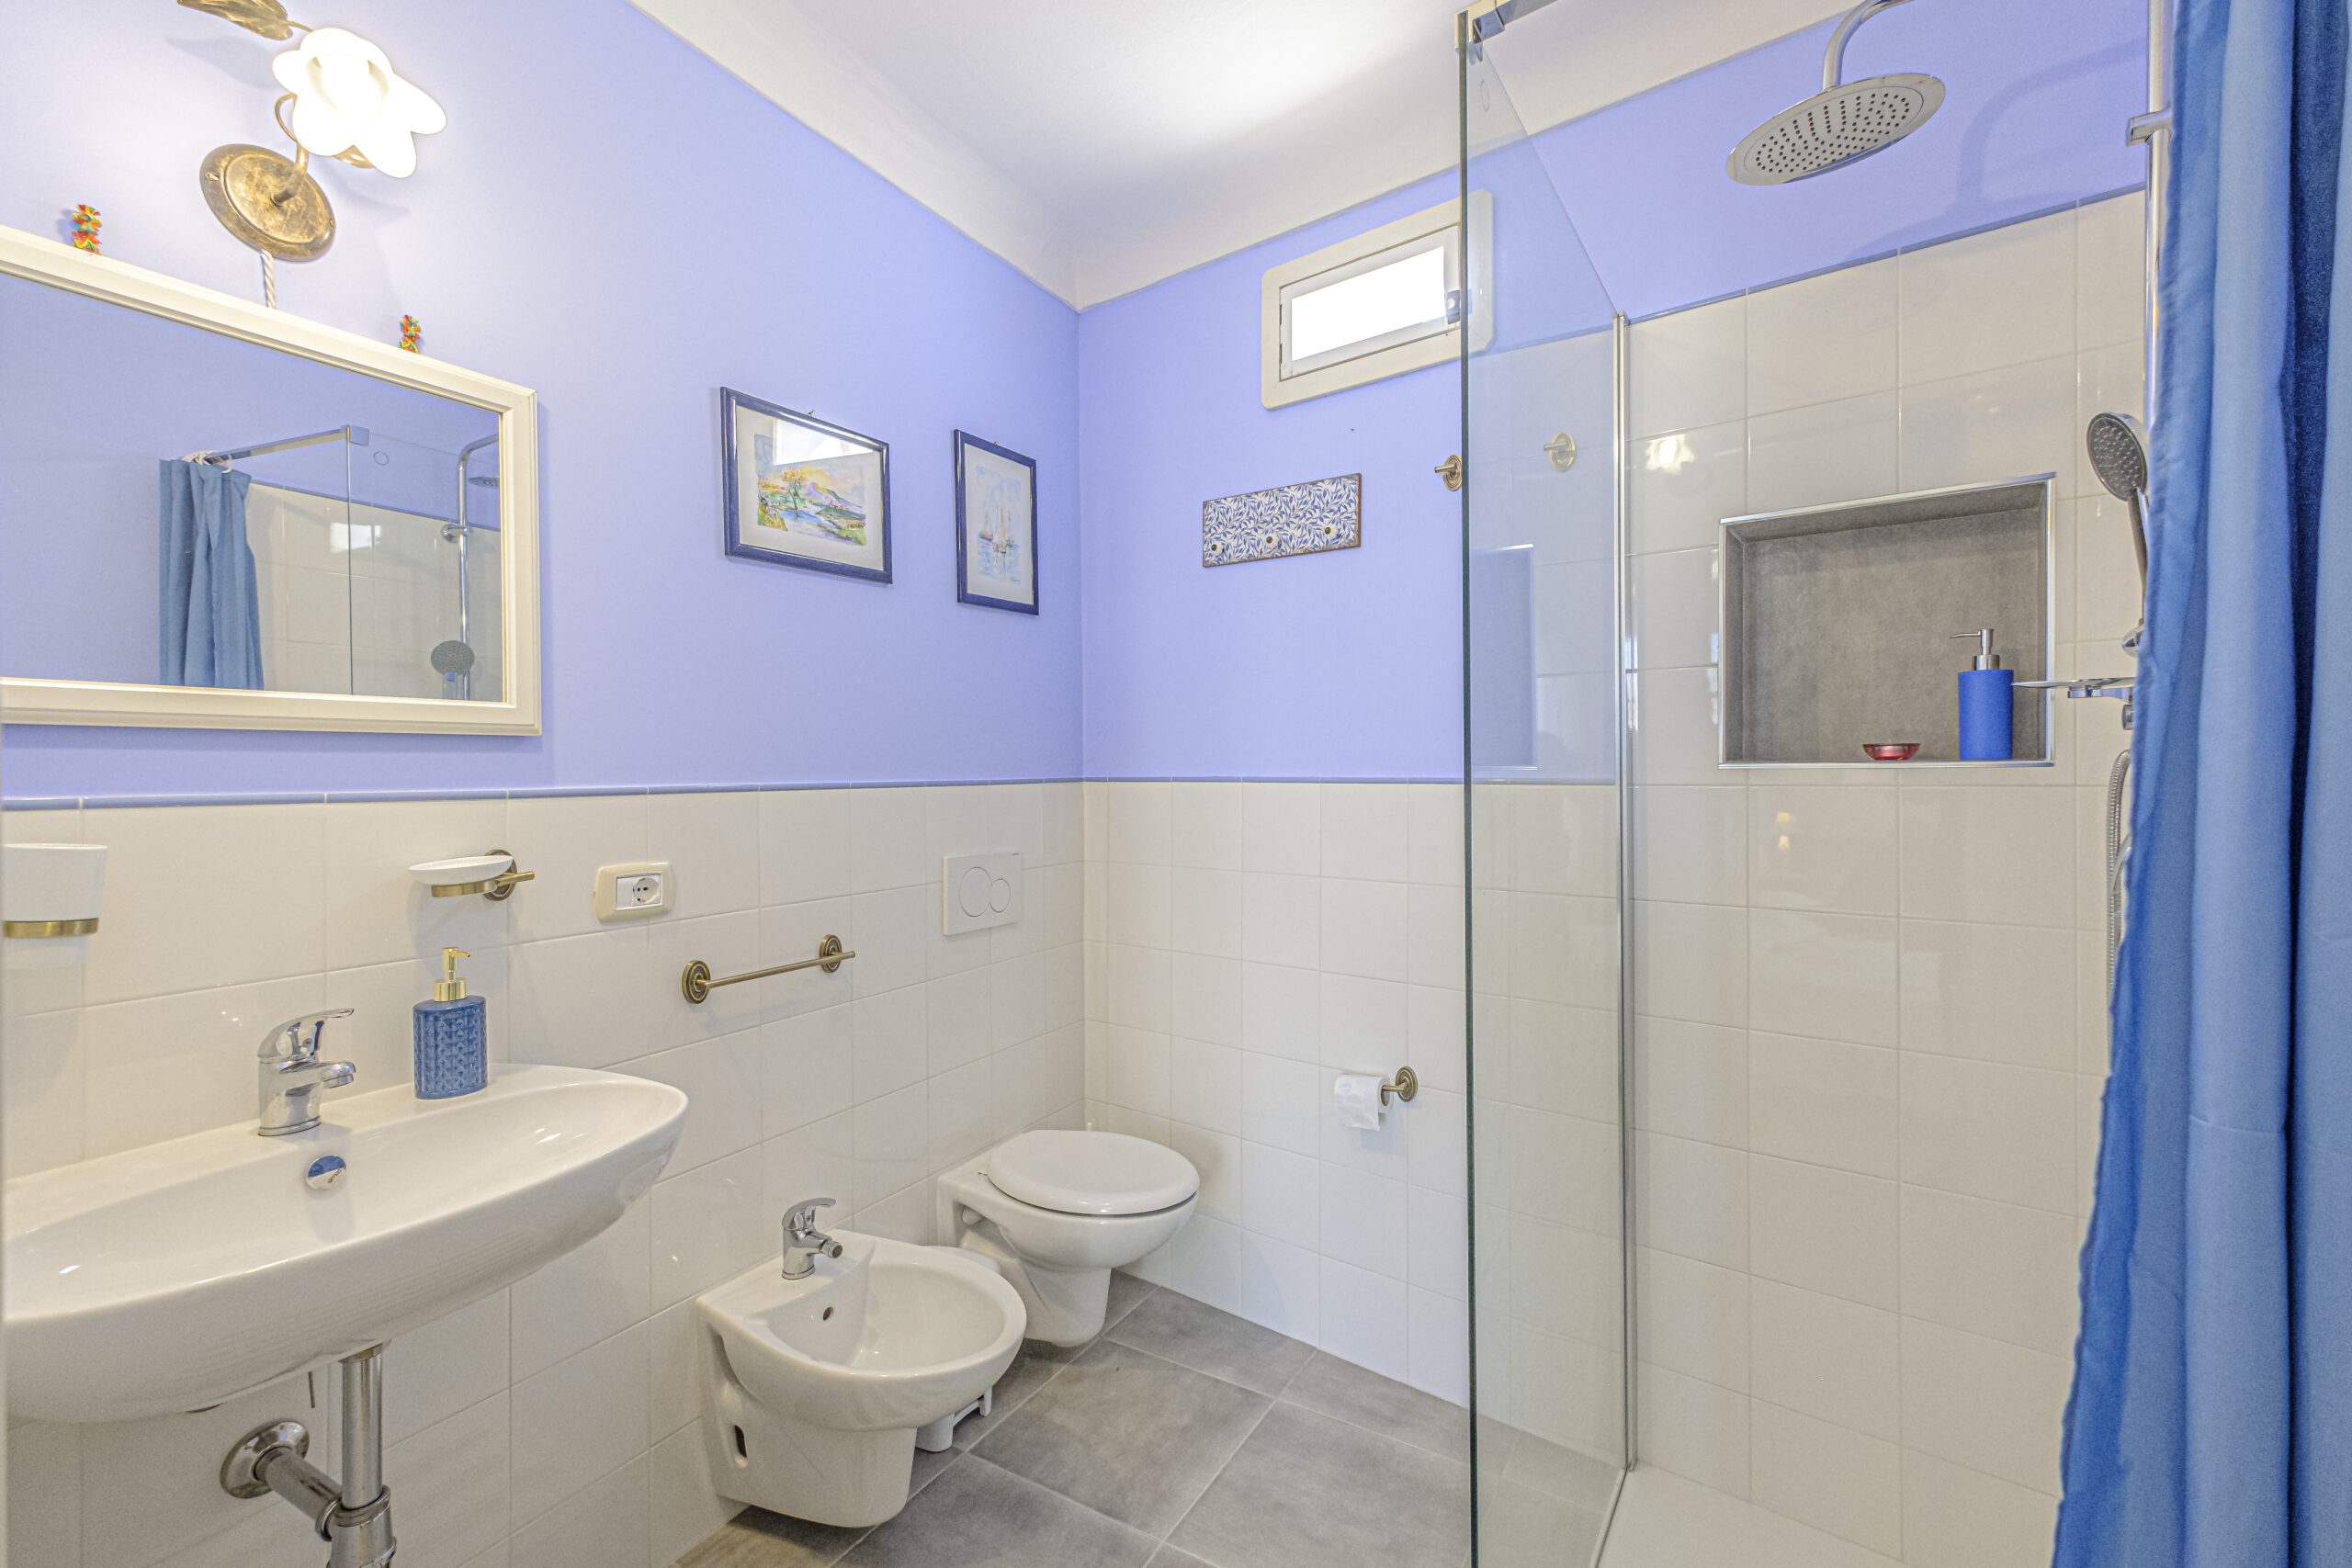 3 Calliope bathroom